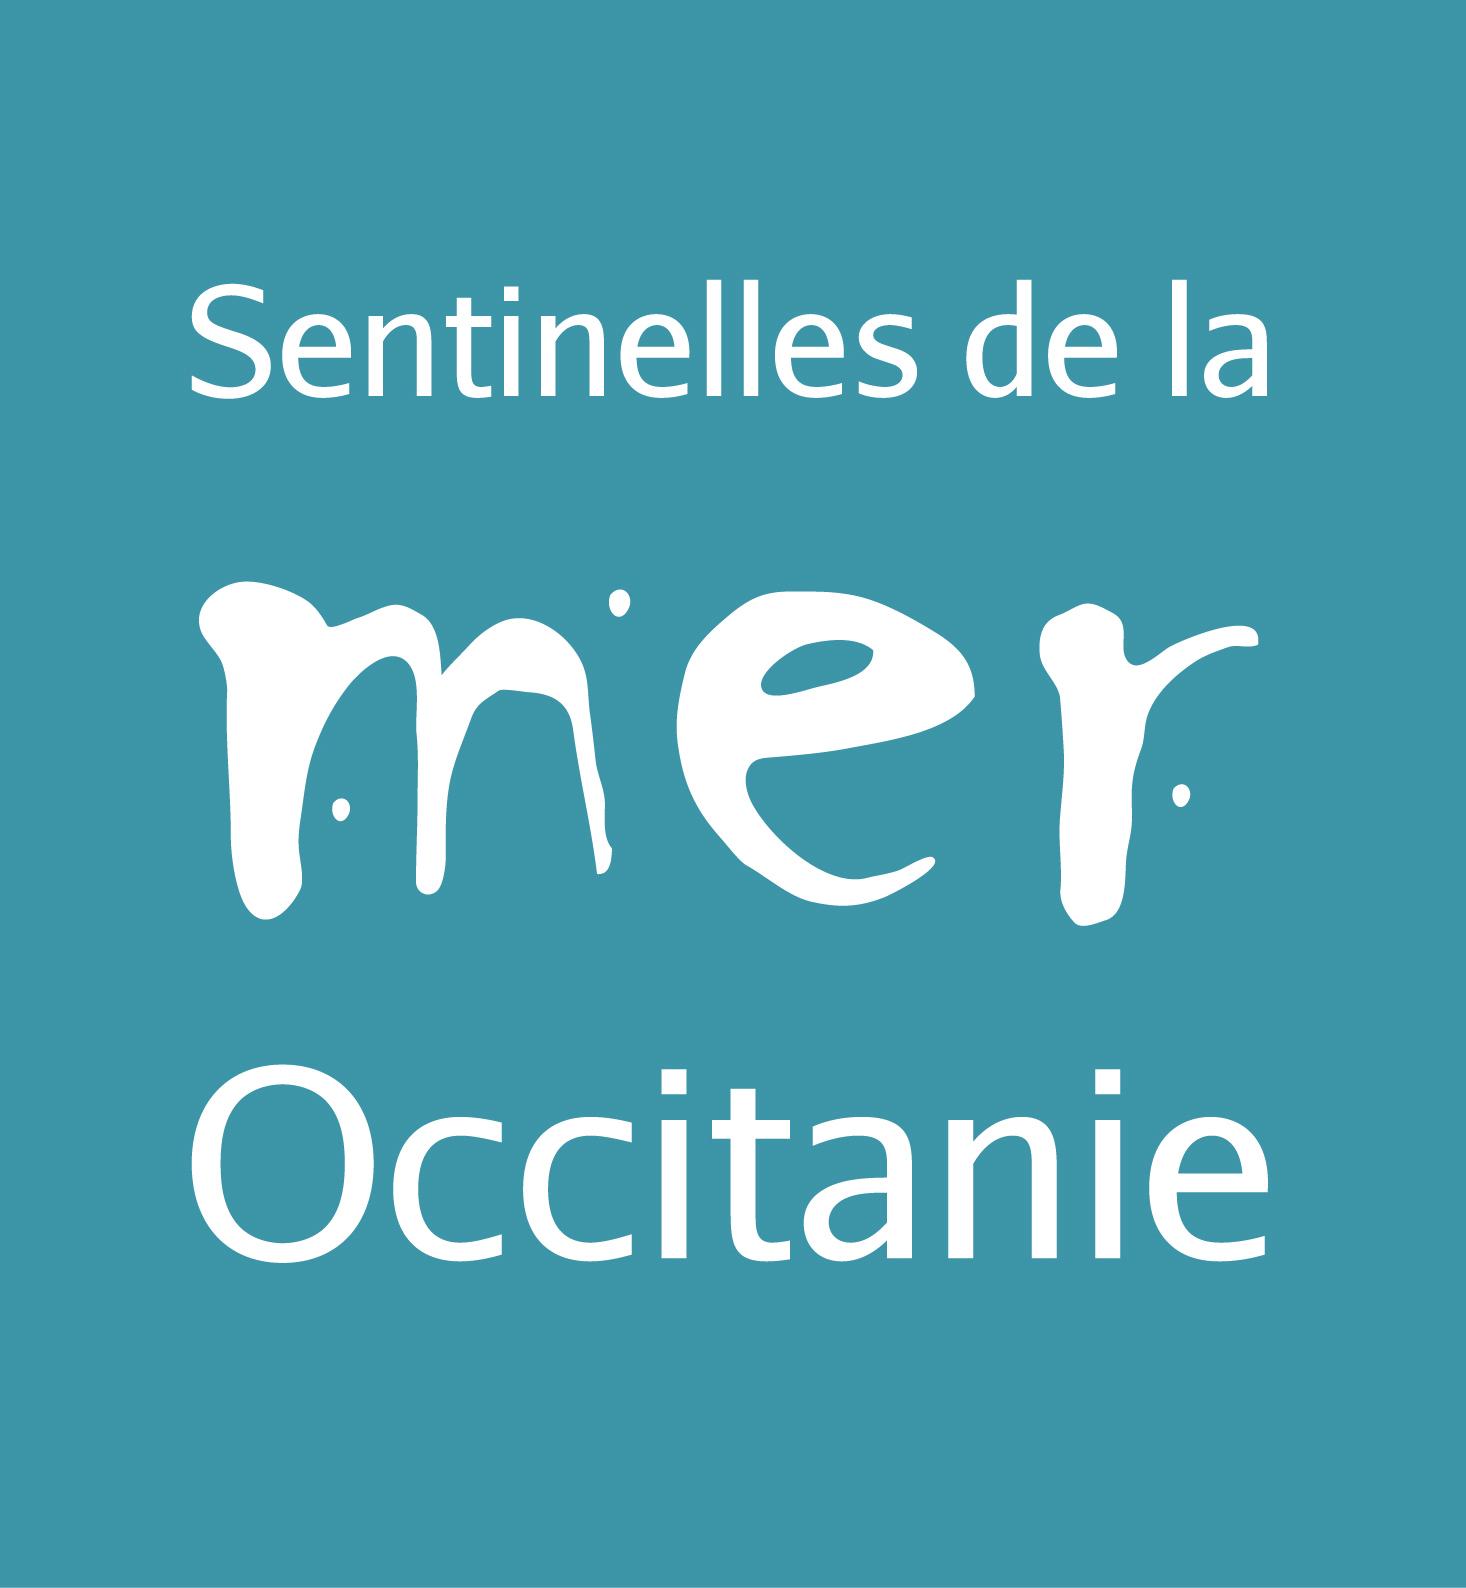 Sentinels of the Occitanie Sea